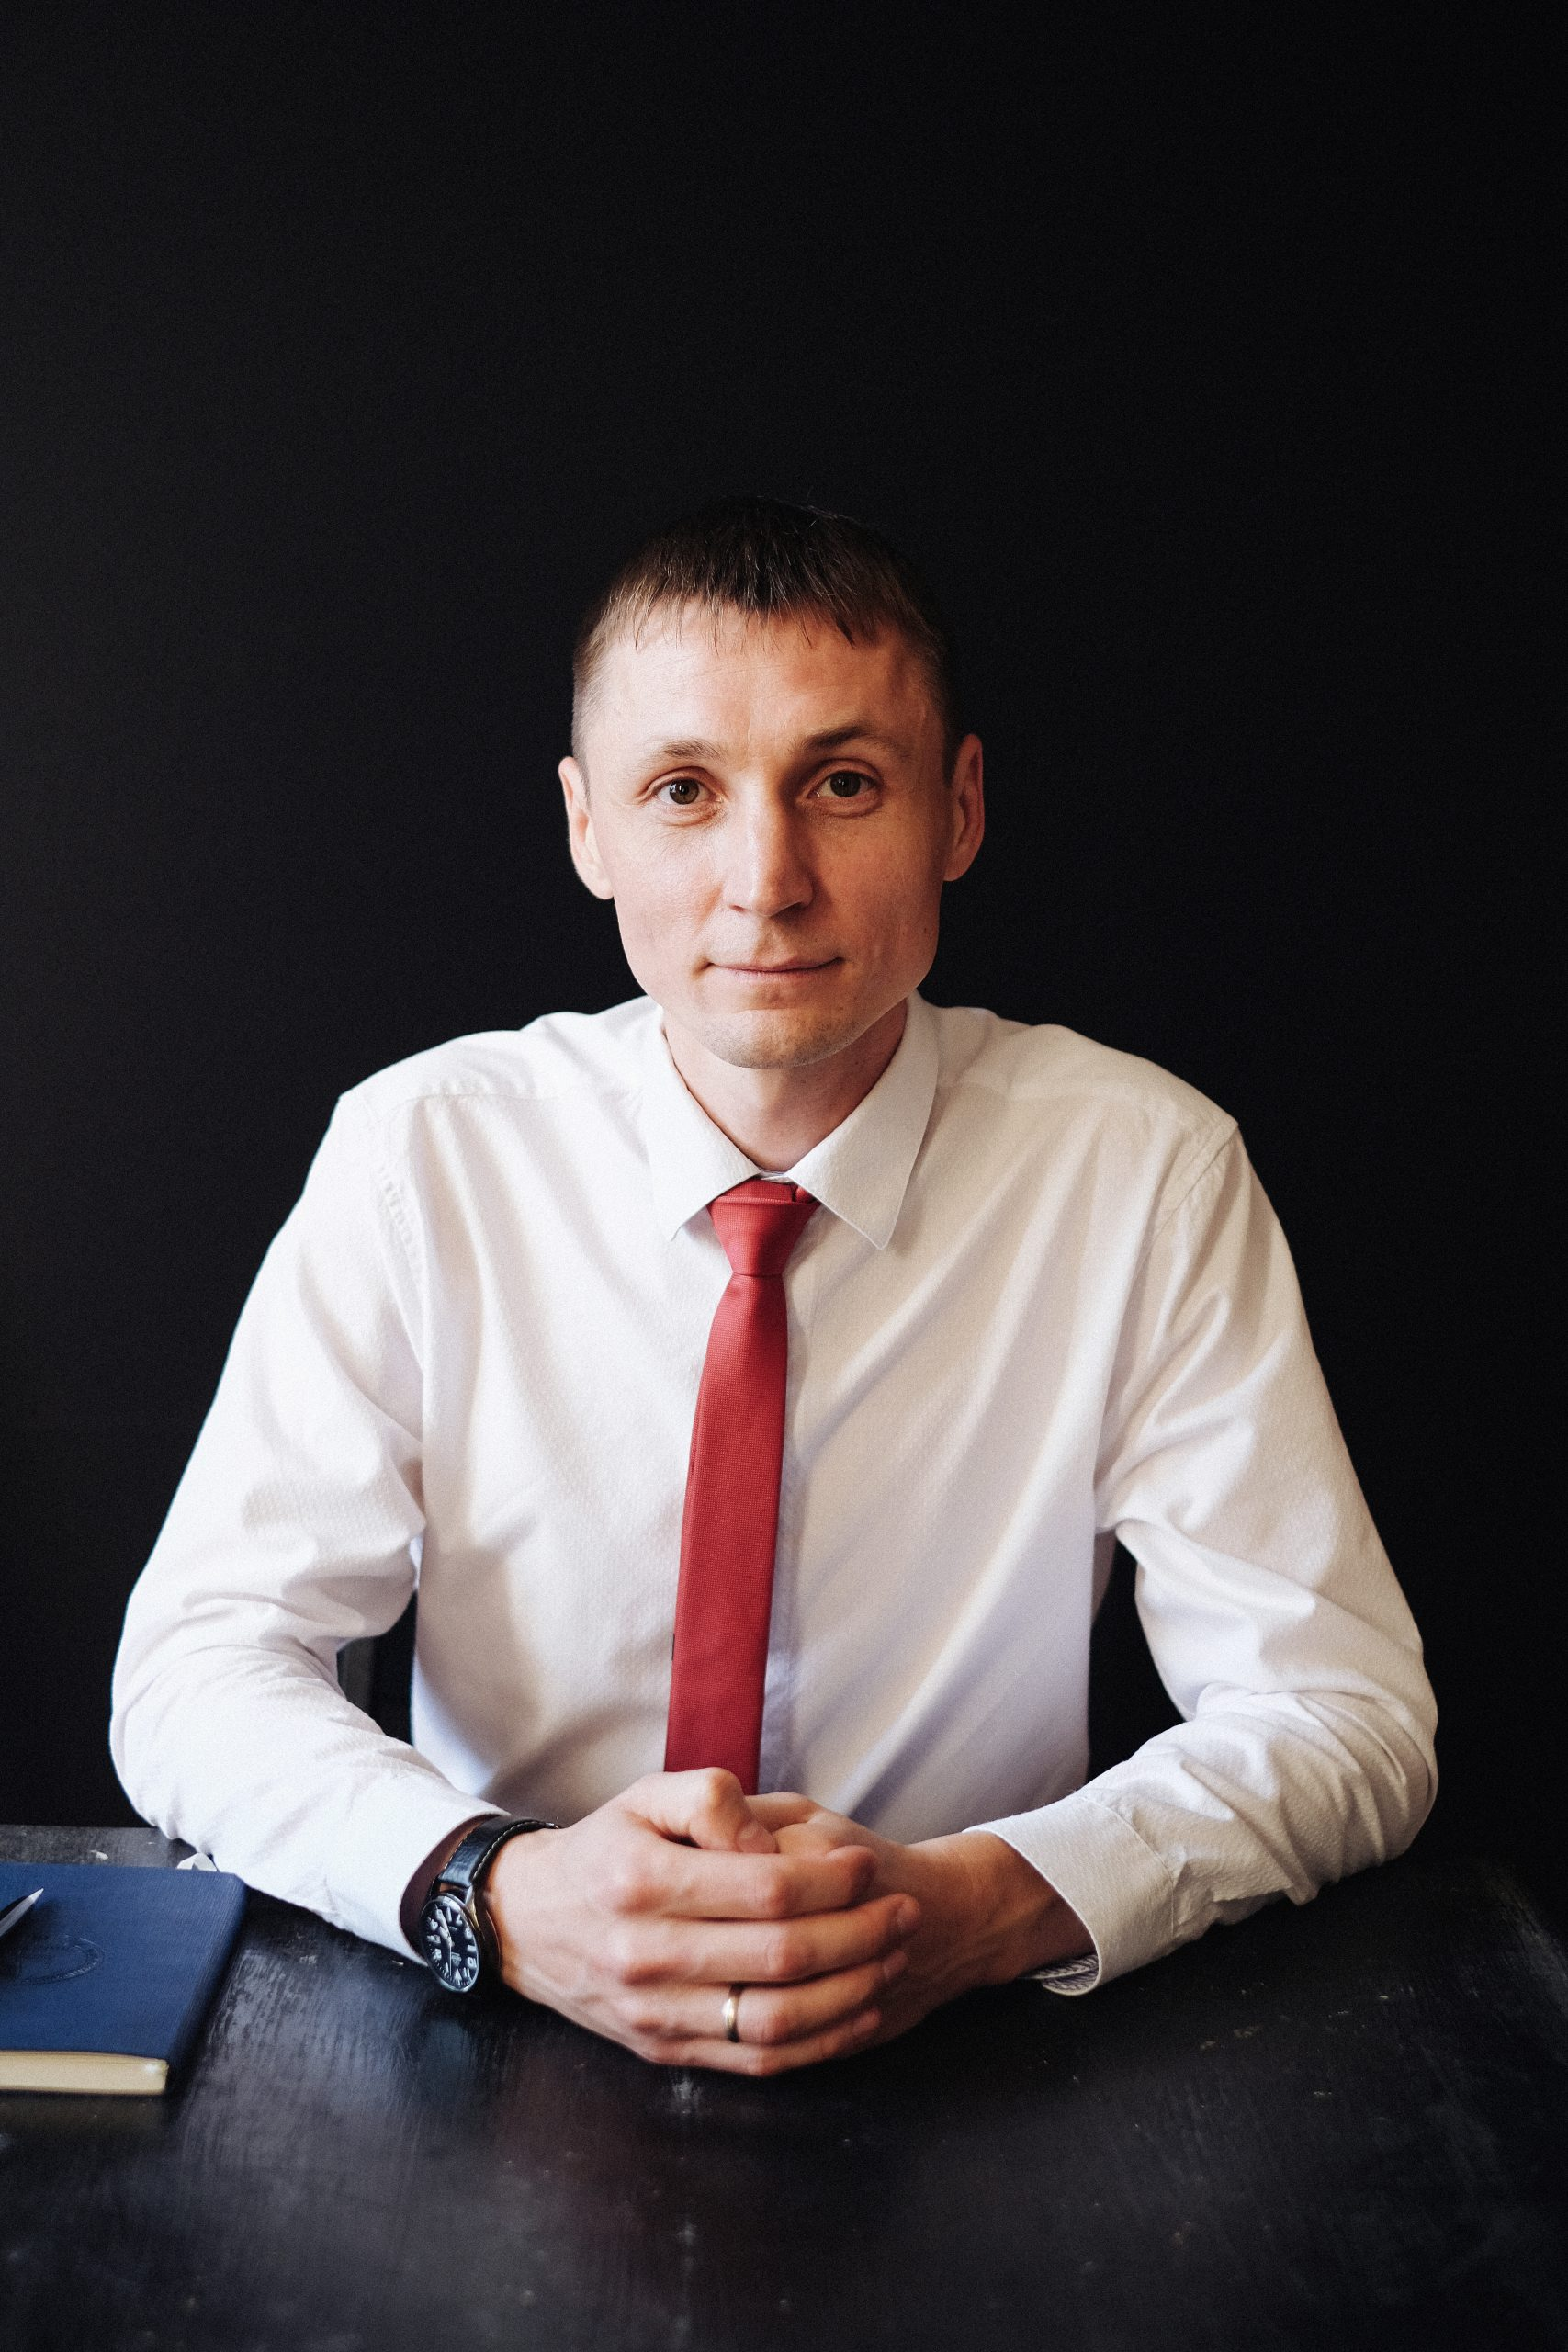 Реклама ВКонтакте цена от рекламного агентства и пример расчета бюджета